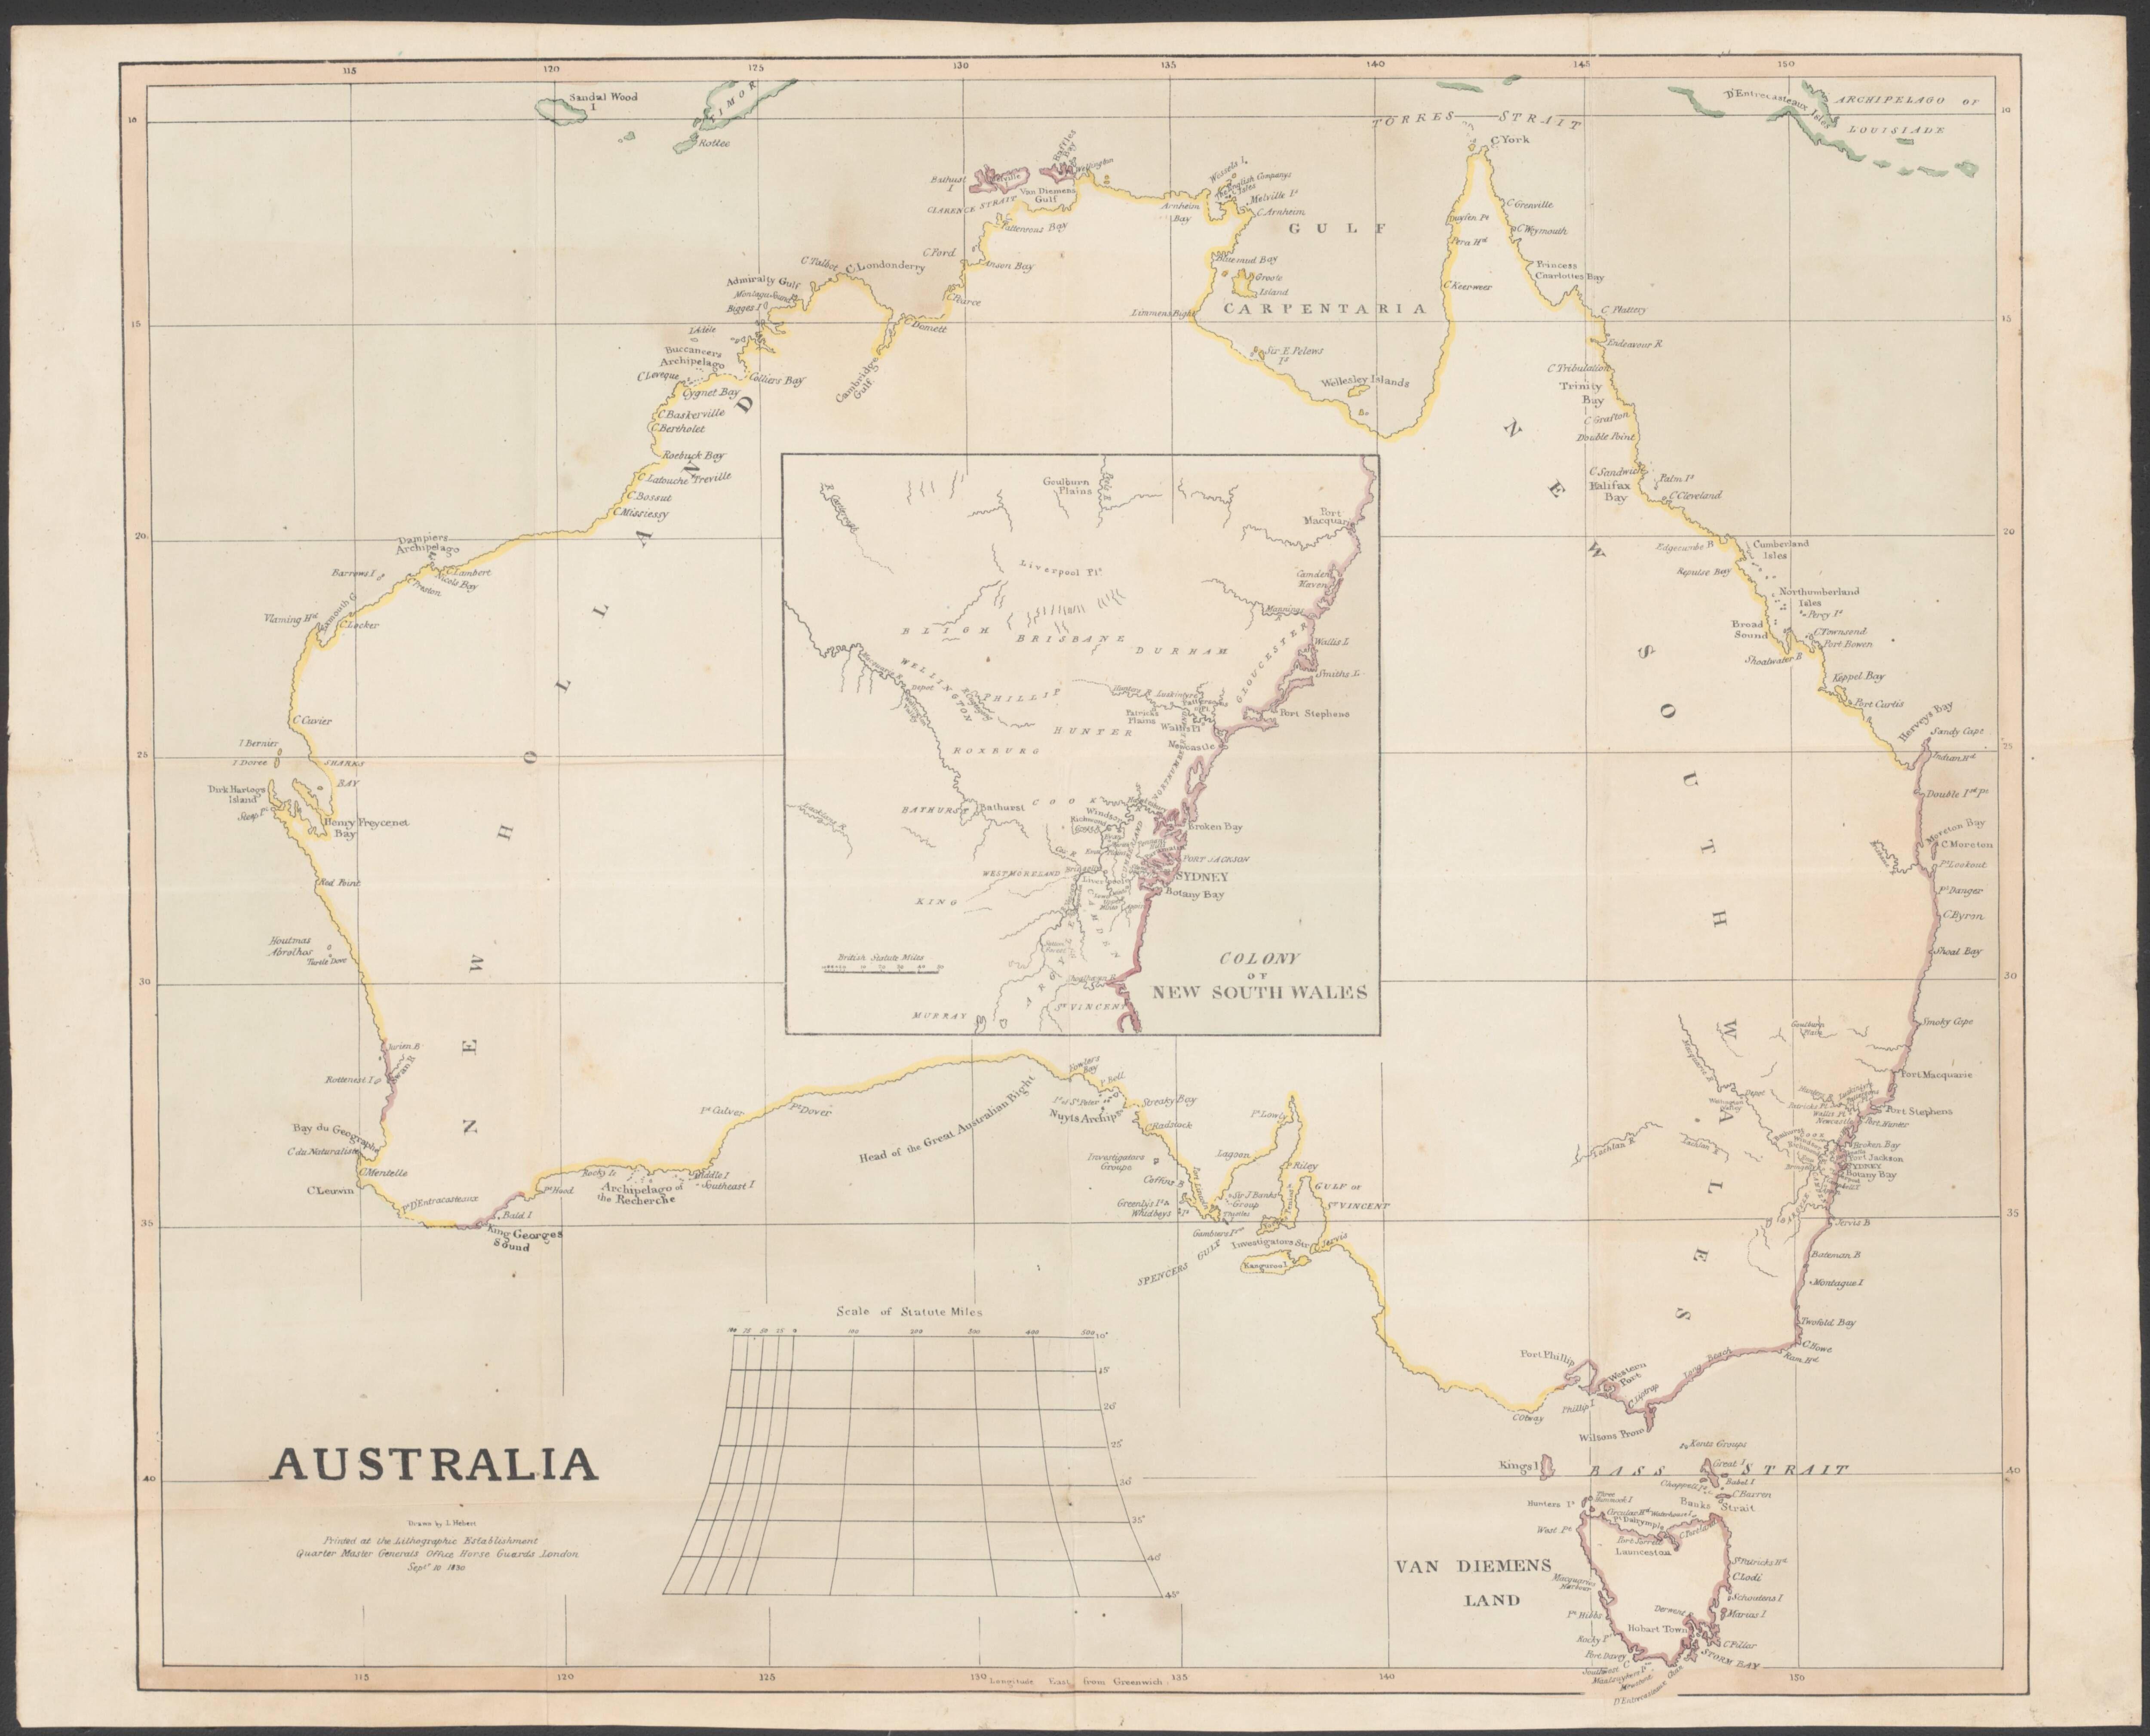 Map Of Australia 1830.1830 Map Of Australia Drawn By L Hebert Maps Of Australia